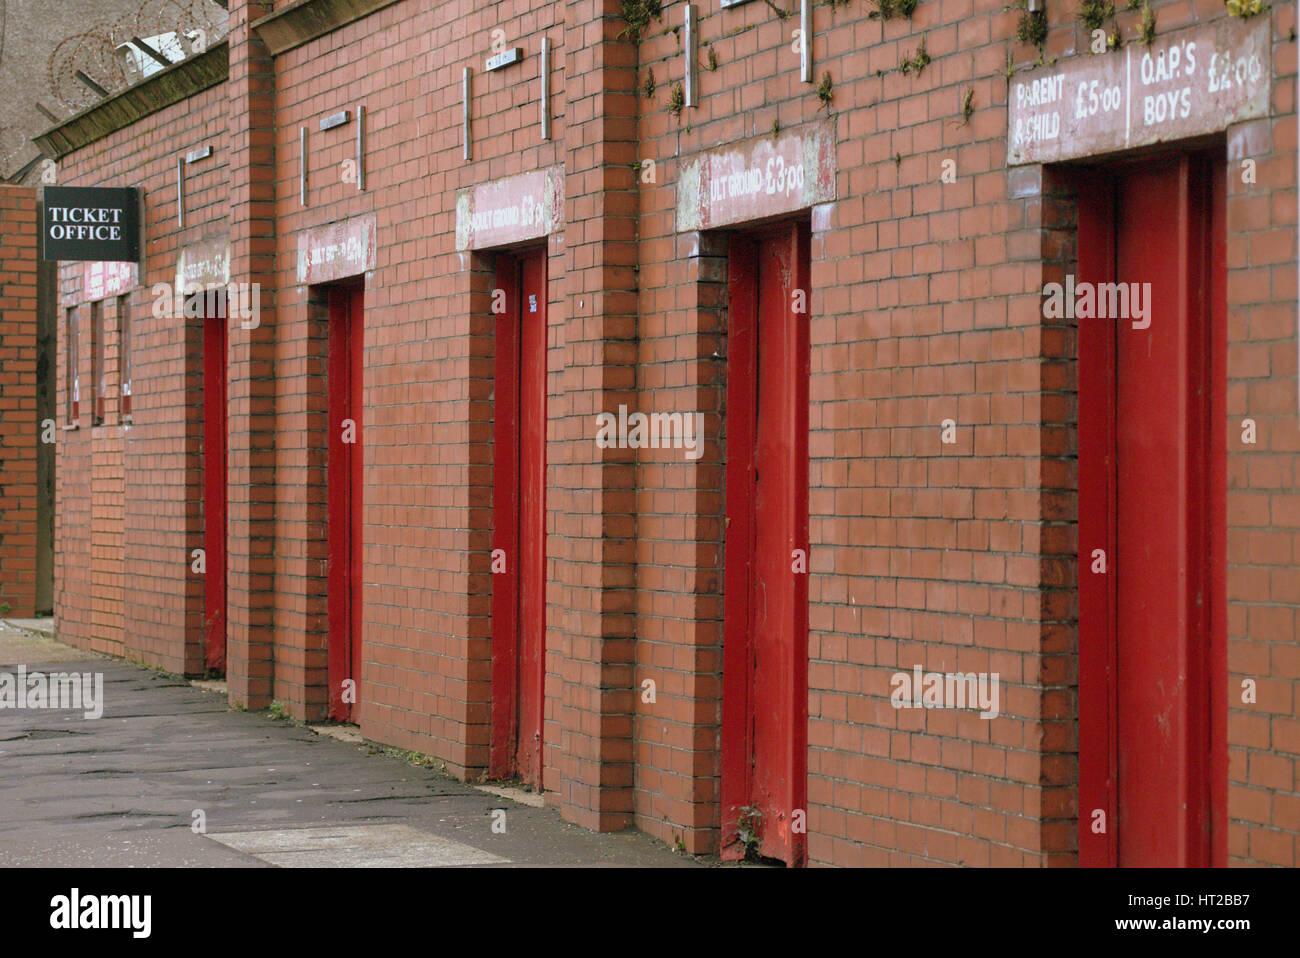 partick thistle football club vintage turnstiles - Stock Image